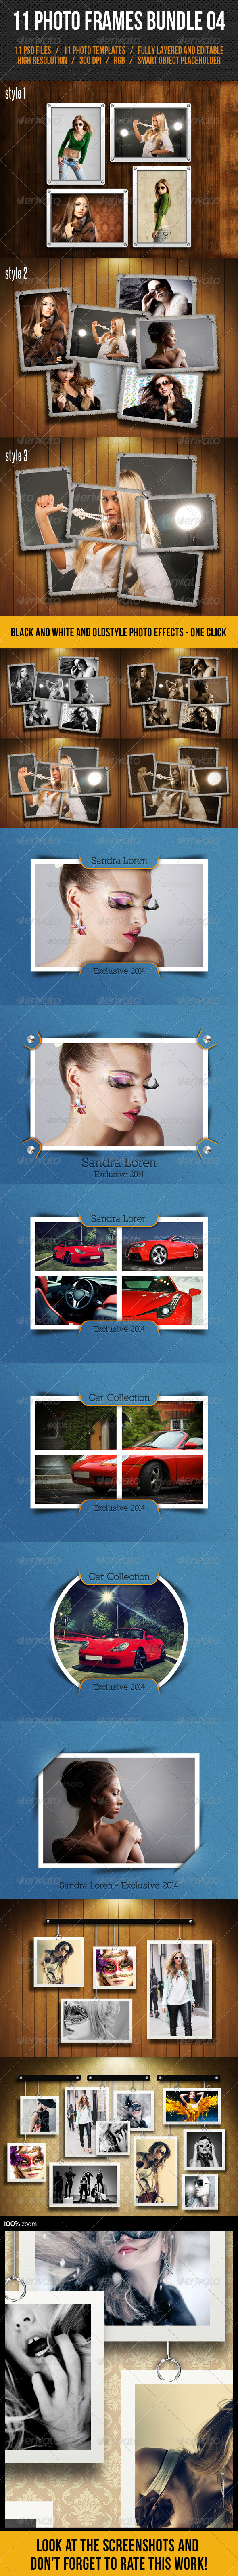 GraphicRiver 11 Photo Frames Bundle 04 7748657